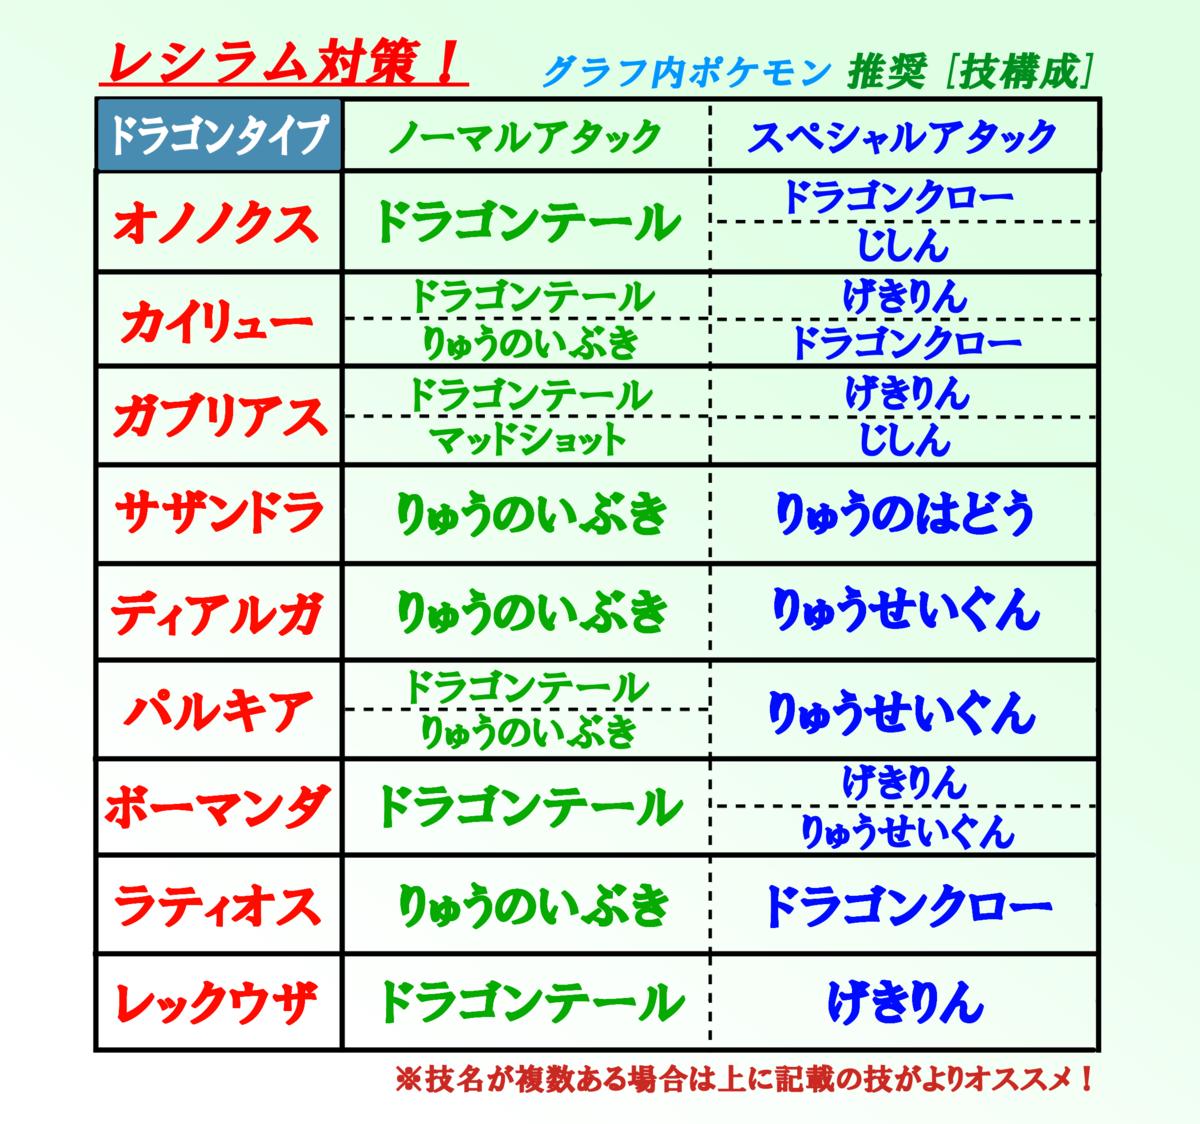 f:id:Kazumin0331:20200522011549p:plain